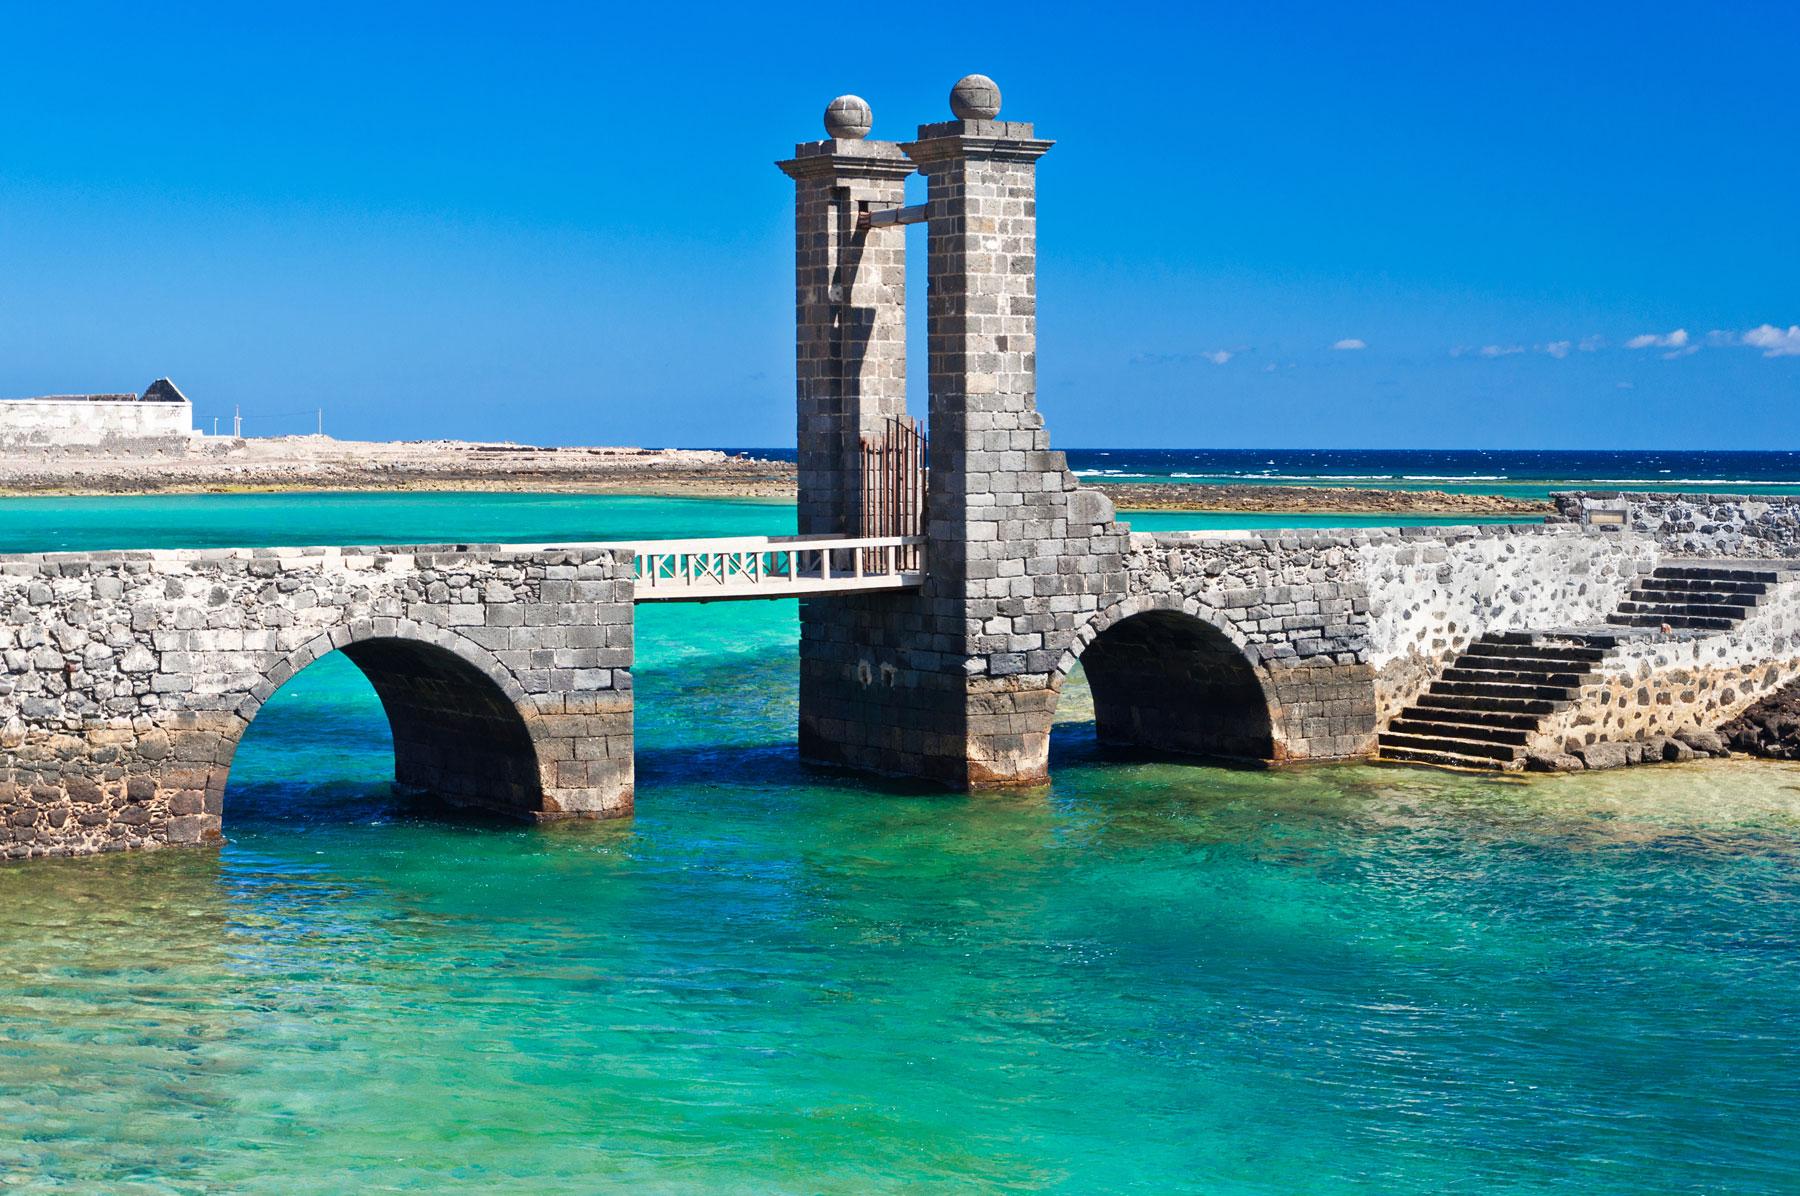 Old stone bridge over stunning blue ocean to Castle San Gabriel Arrecife Lanzarote